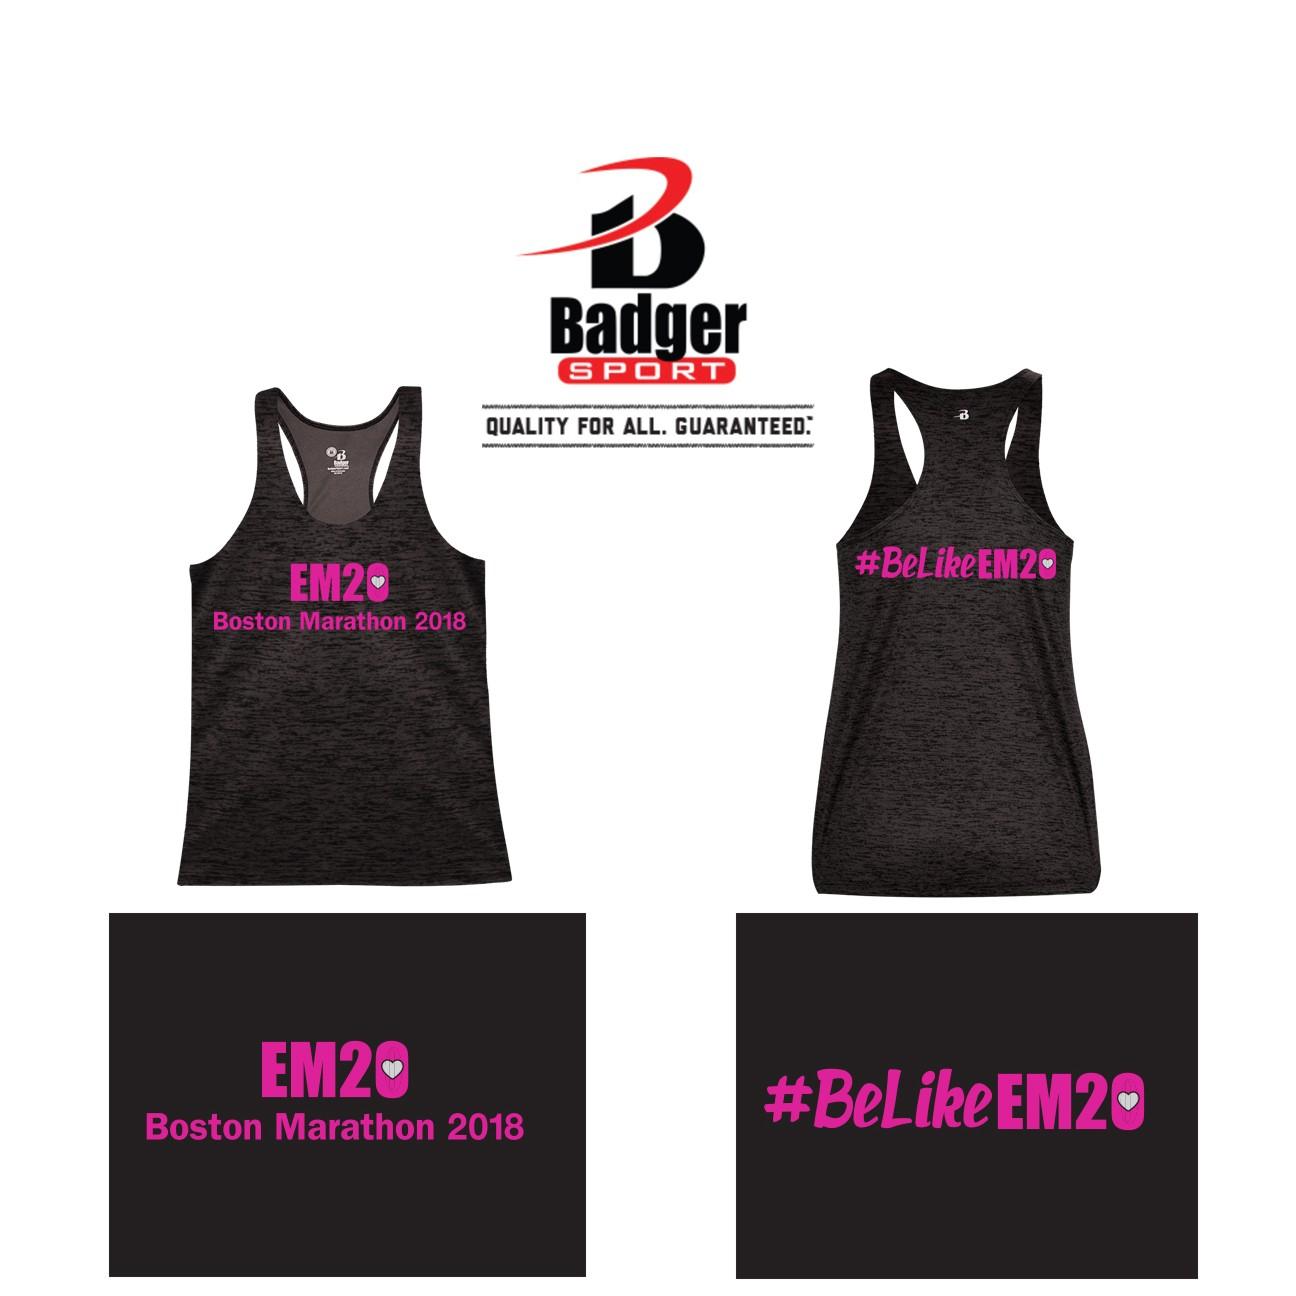 Emma Ryan Scholarship Fund Badger Brand Tonal Blend Racerback Tank, Performance, Women's, Loose, SPECIAL EDITION BOSTON MARATHON 2018